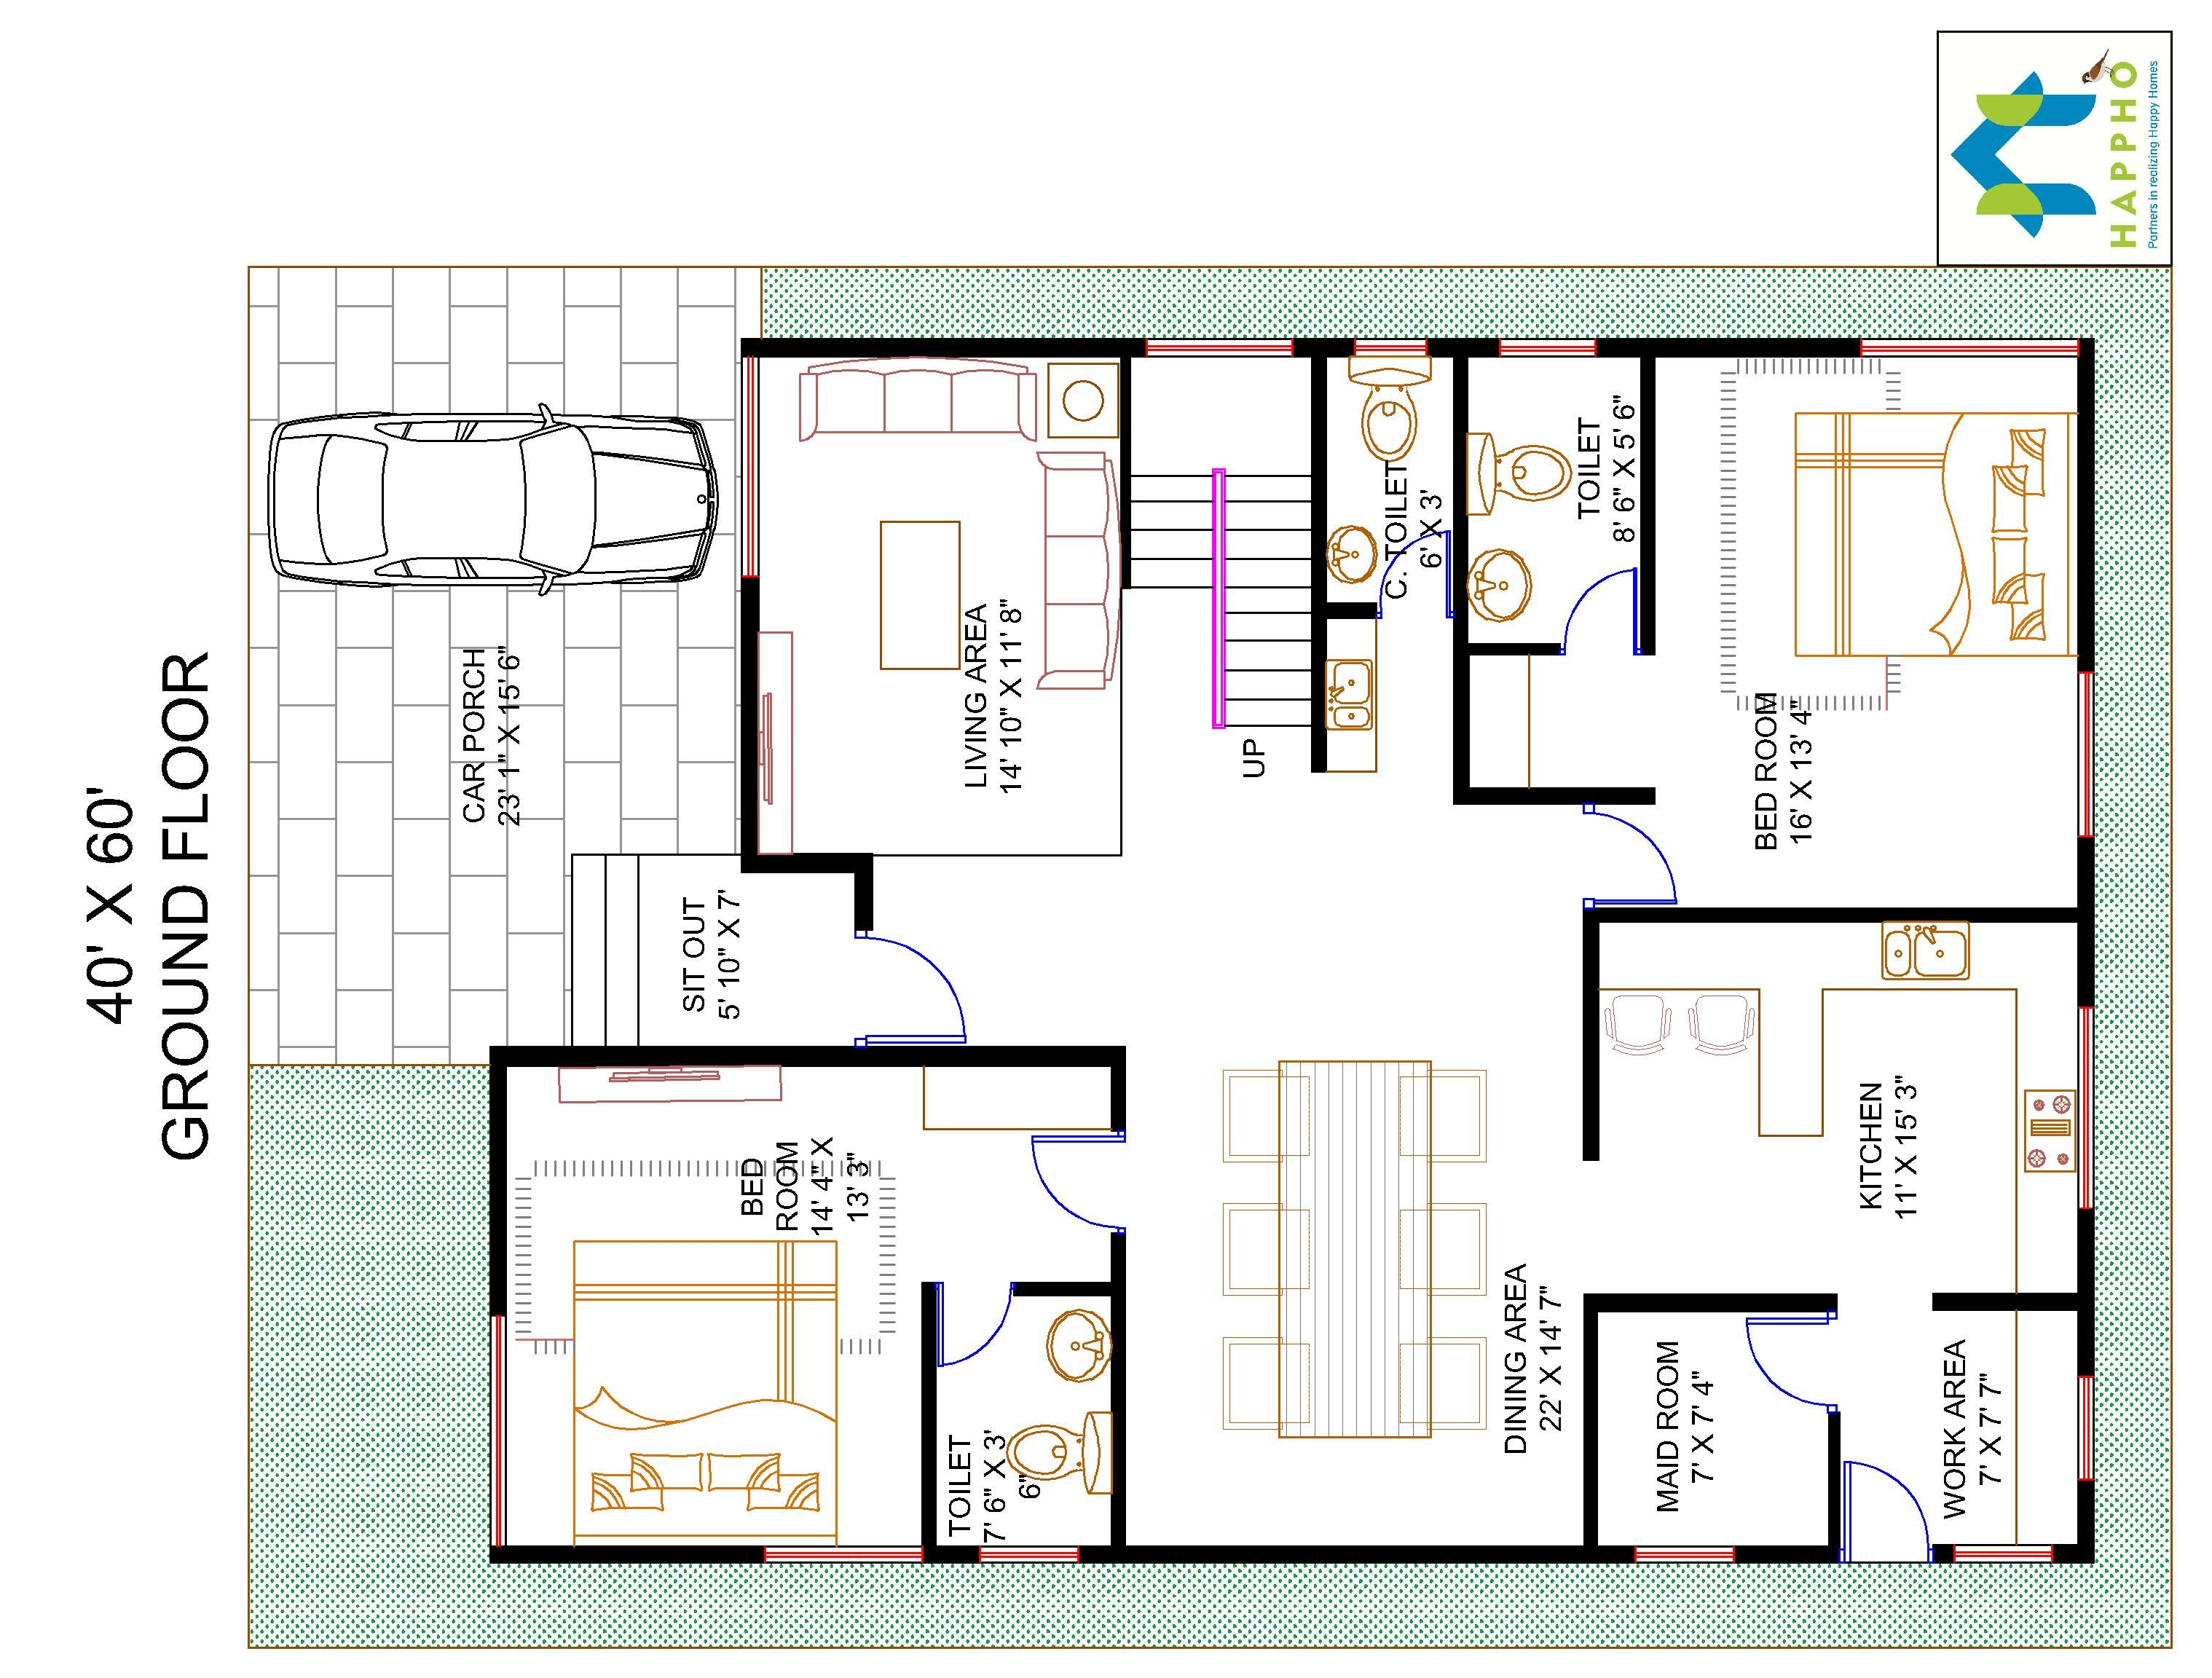 4BHK Floor Plan for 40 X 60 Plot 2400 Square Feet267 SquareYards  Happho